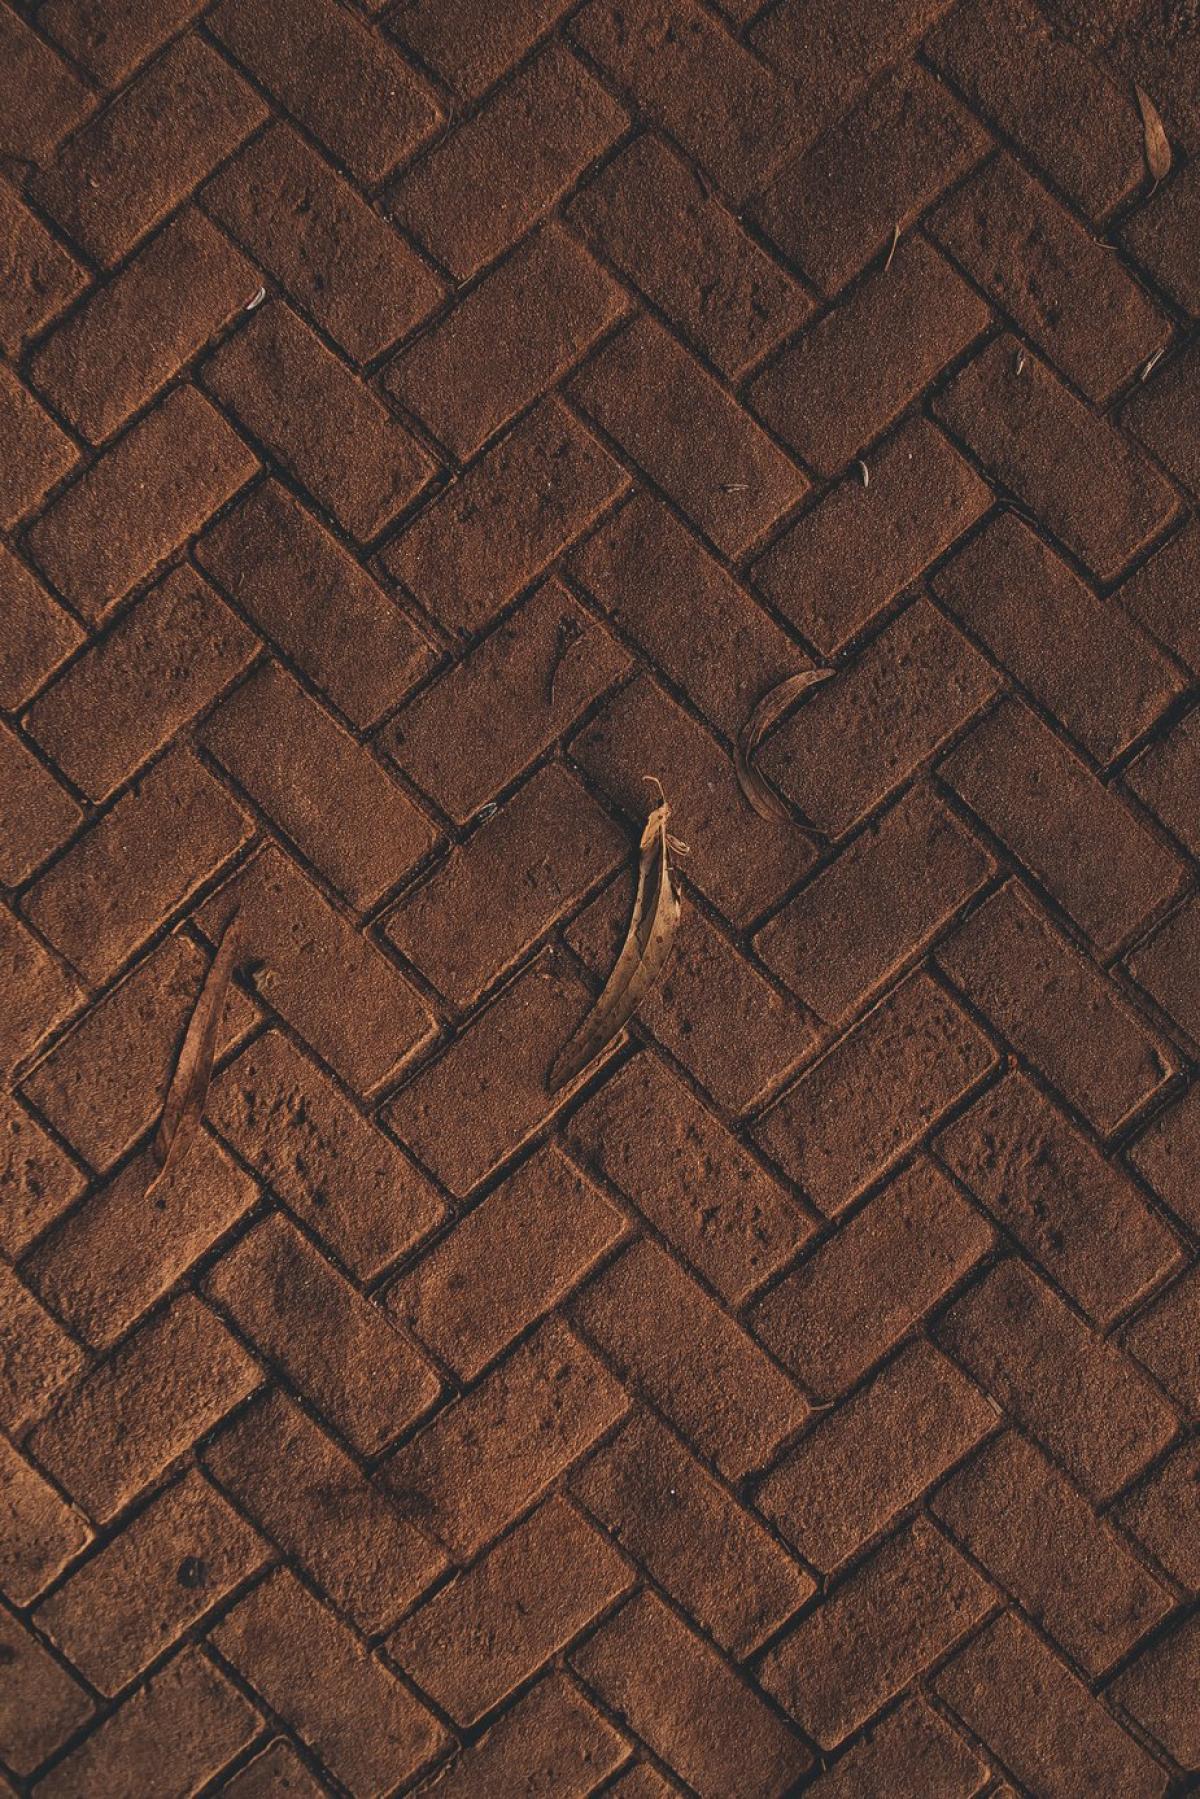 Brown Camouflage Leaf #422791